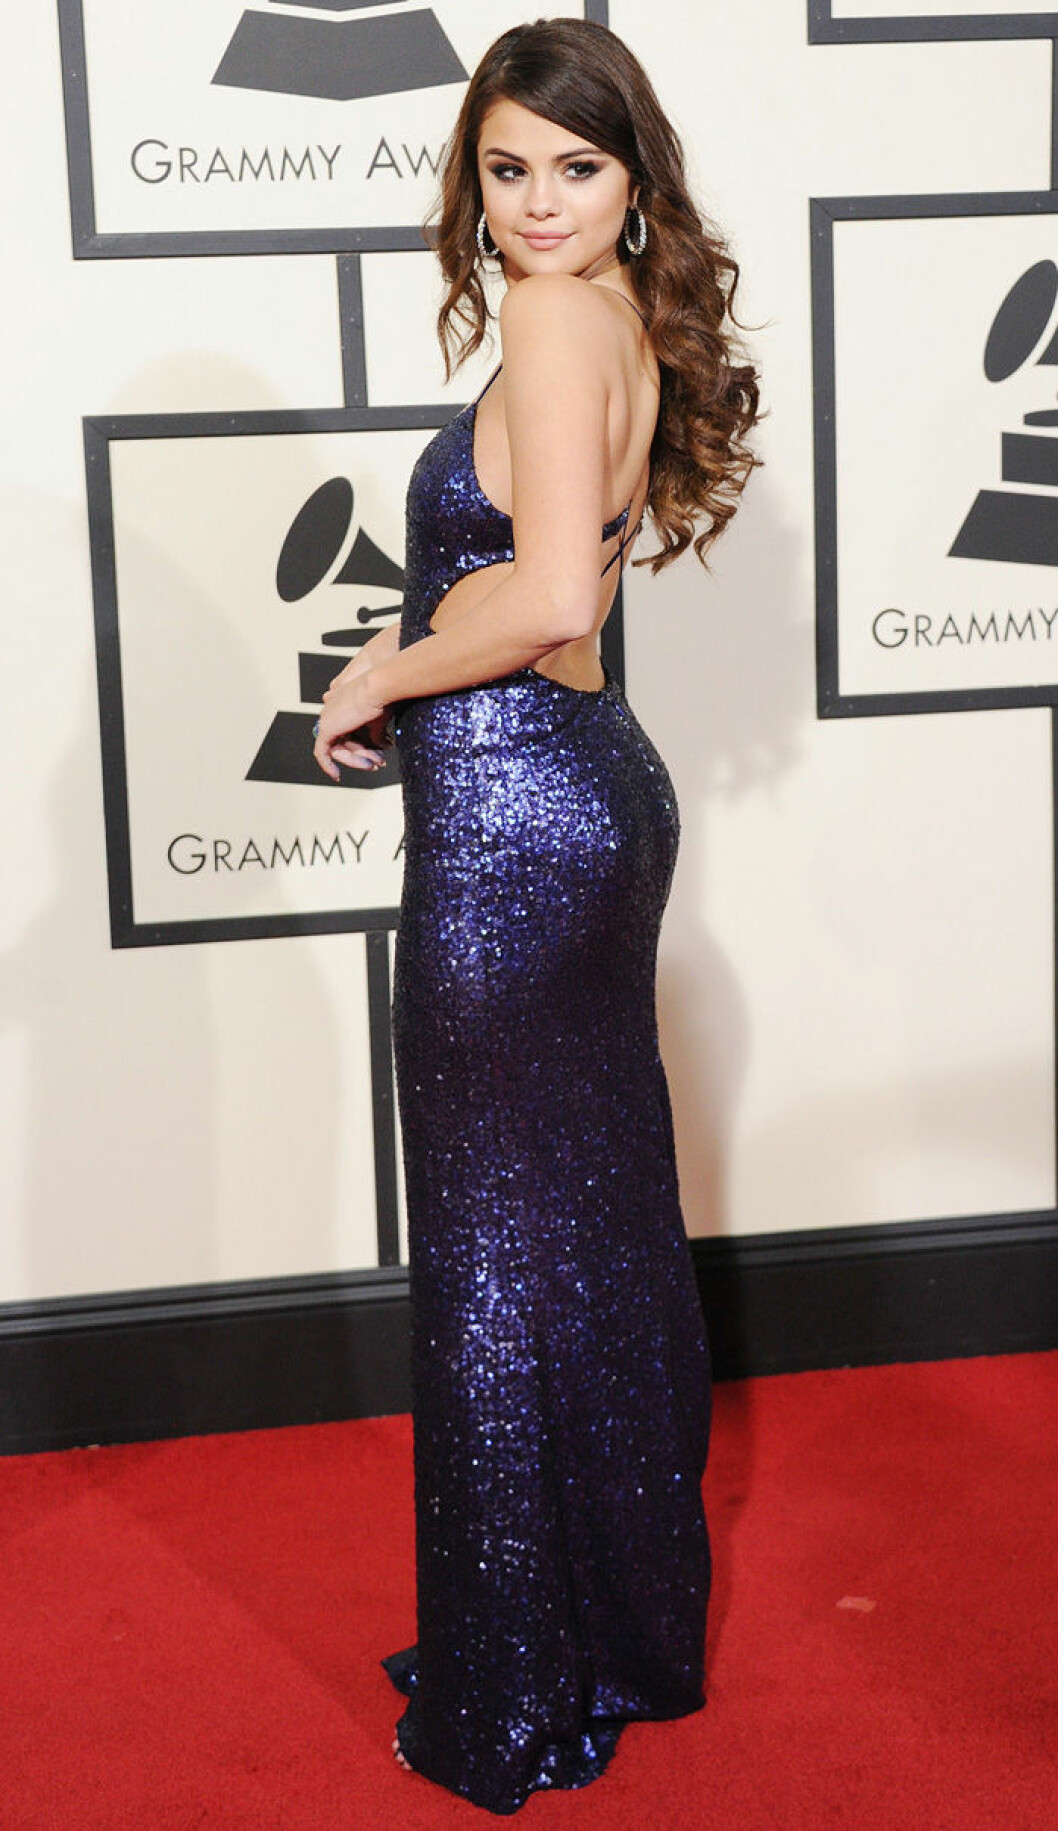 En bild på sångerskan Selena Gomez på Grammy Awards 2016.